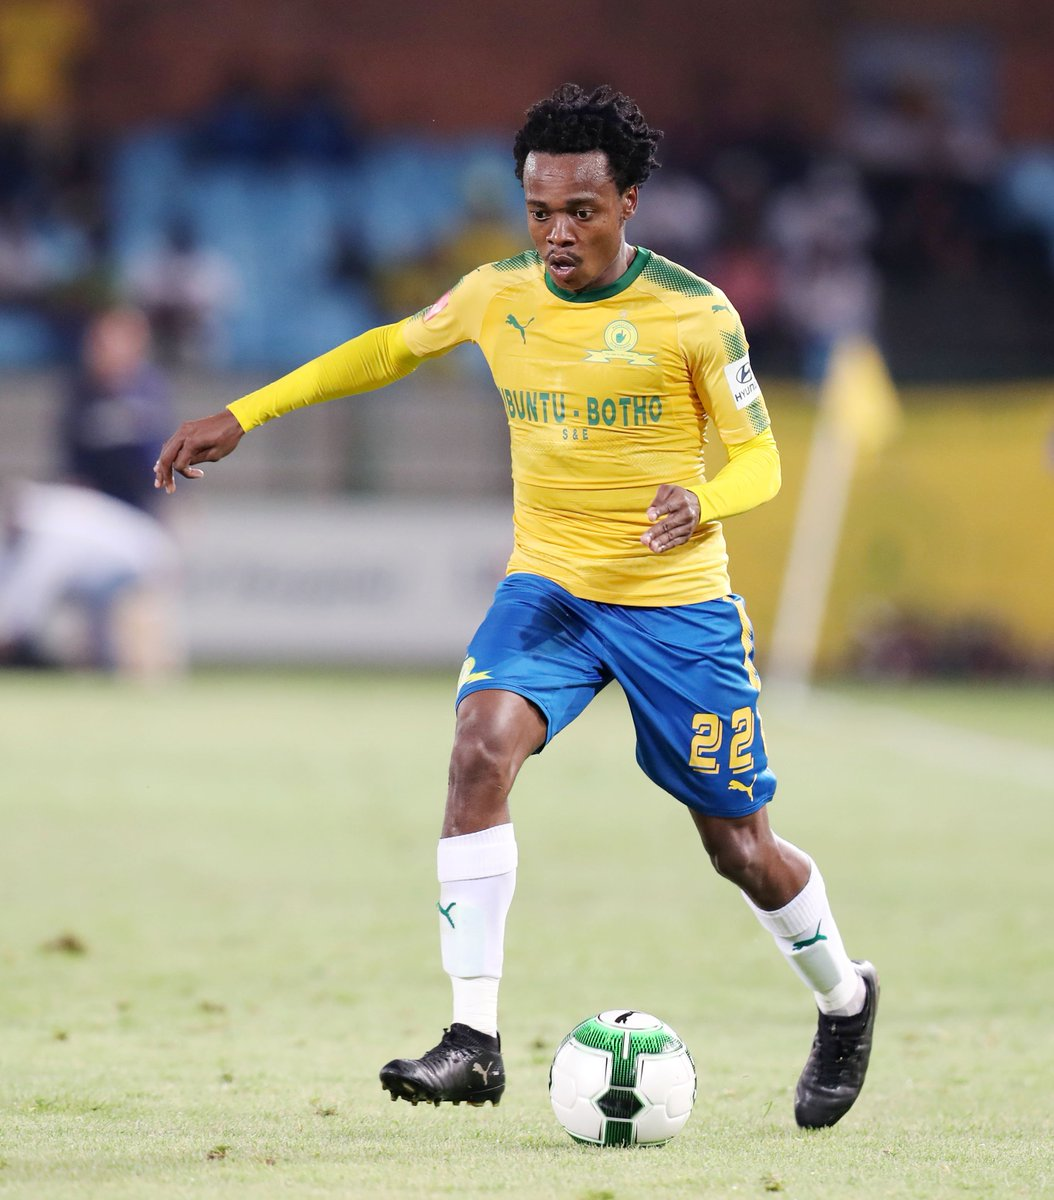 Stuart Baxter explains why he made a U-turn in Thapelo Morena selection